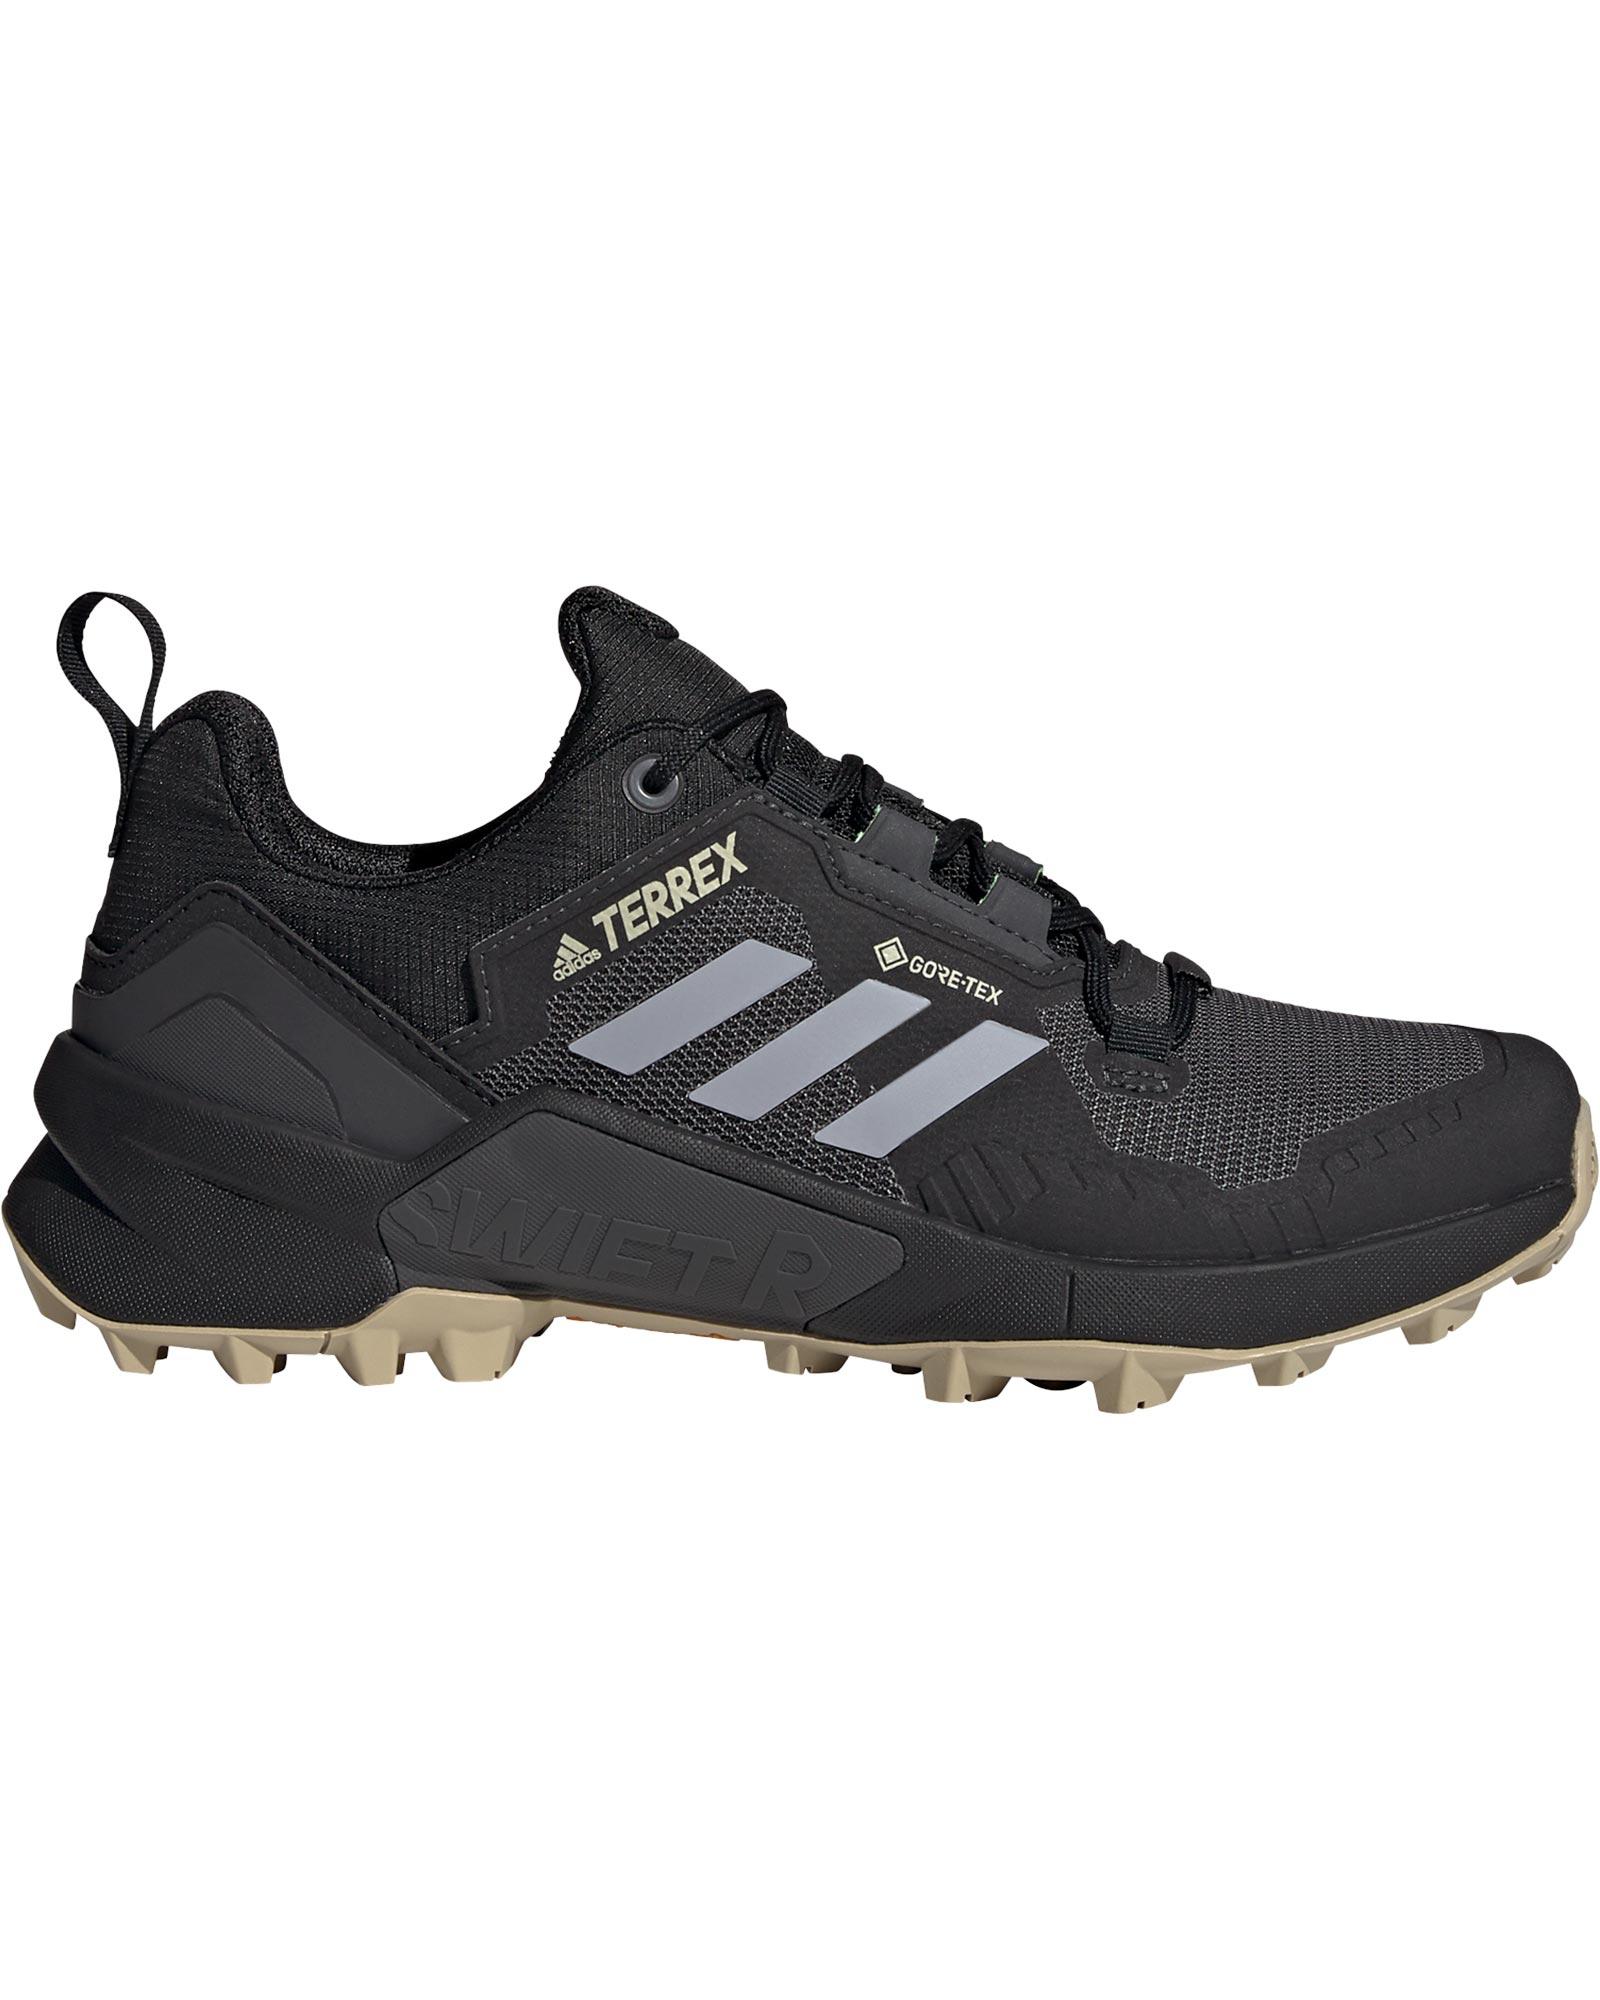 Adidas Terrex Terrex Swift R3 GORE-TEX Women's Shoes 13